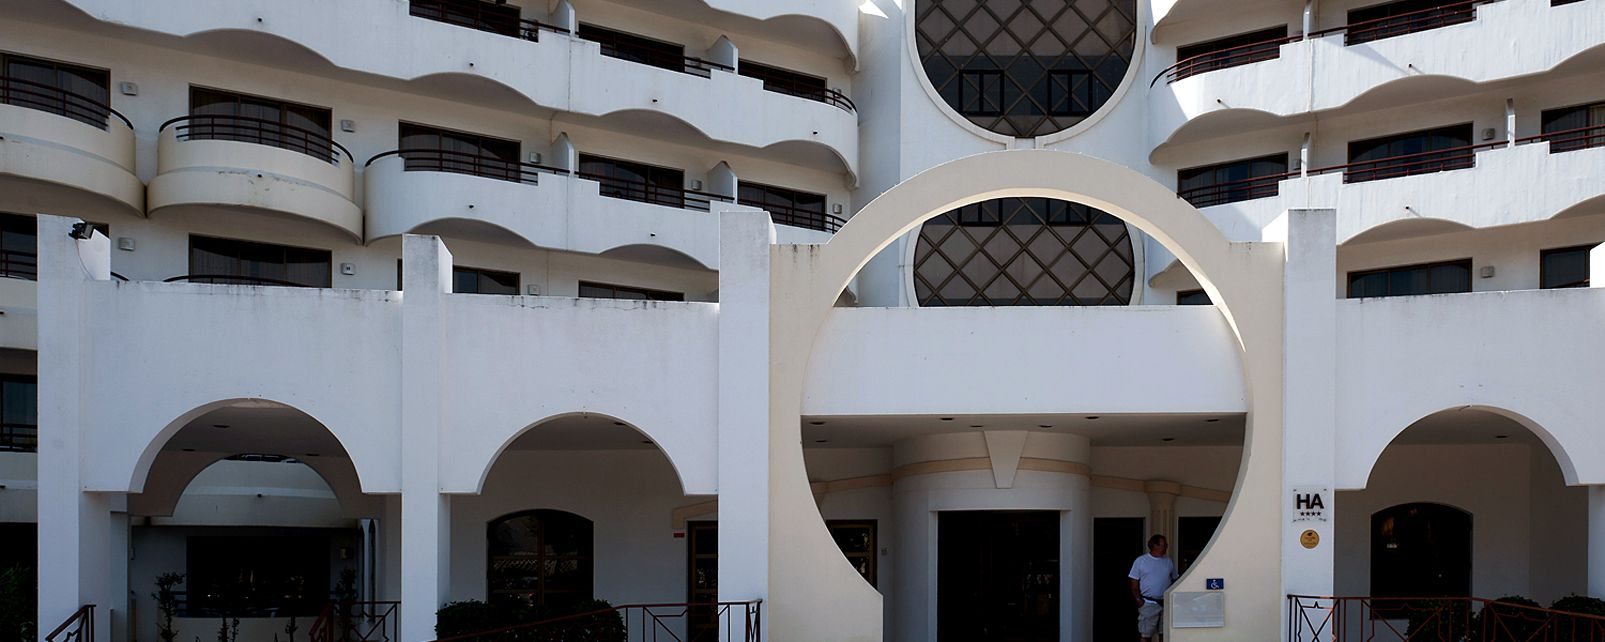 Hôtel Vila Galé Cerro Alagoa